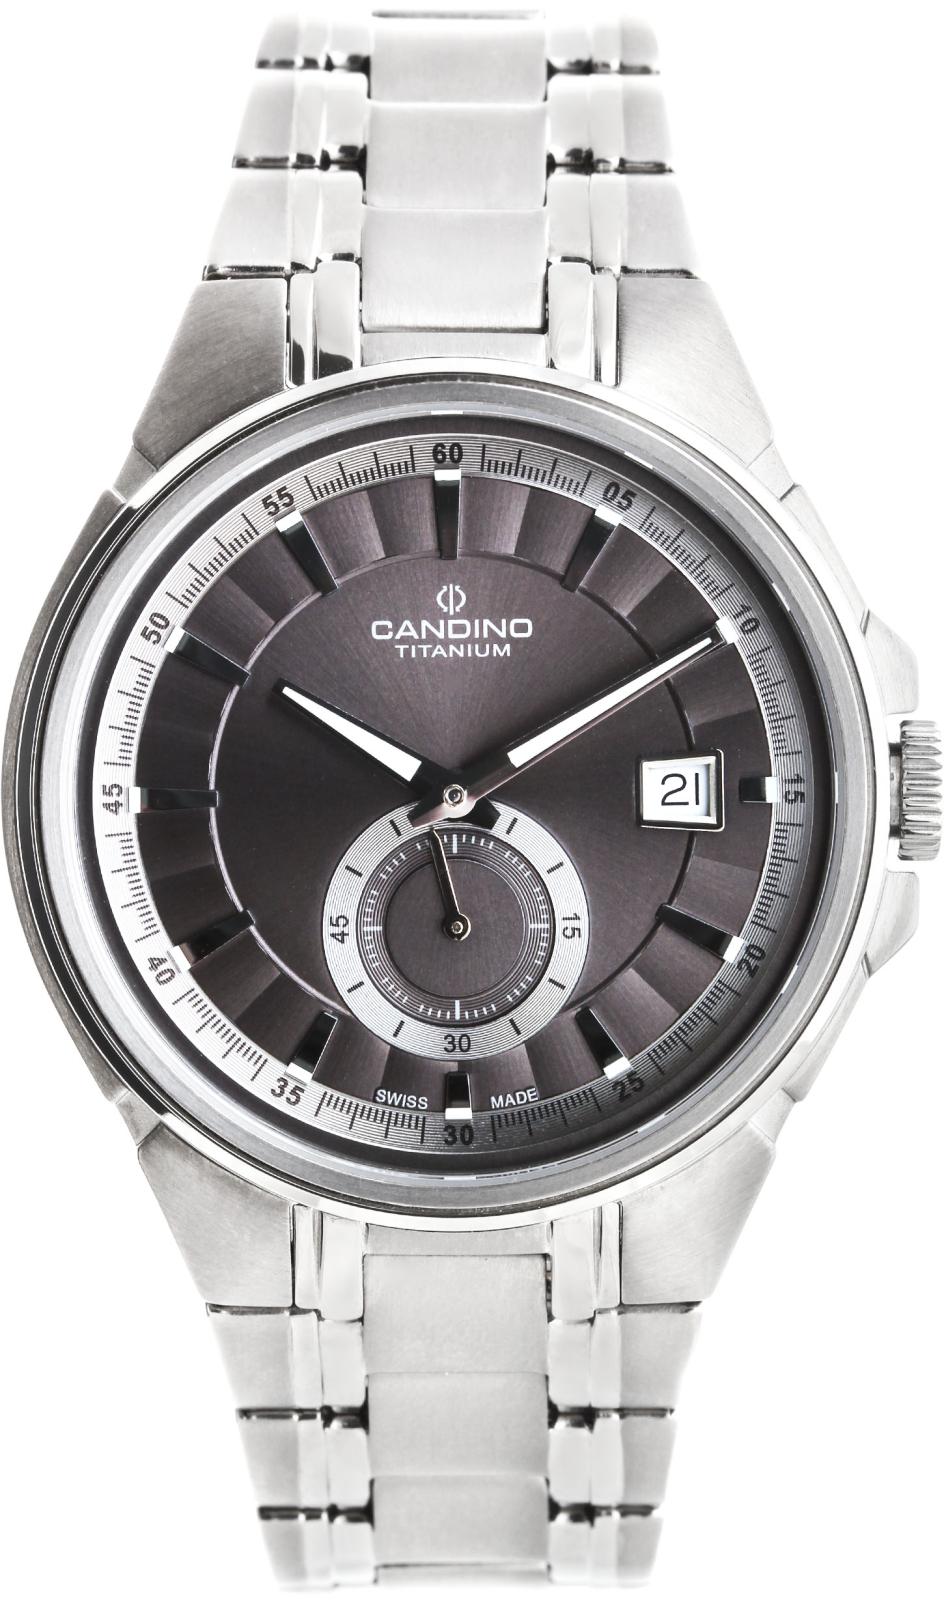 Candino Titanium C4604/1Наручные часы<br>Швейцарские часы Candino Titanium C4604/1<br><br>Пол: Мужские<br>Страна-производитель: Швейцария<br>Механизм: Кварцевый<br>Материал корпуса: Титан<br>Материал ремня/браслета: Титан<br>Водозащита, диапазон: None<br>Стекло: Сапфировое<br>Толщина корпуса: None<br>Стиль: None